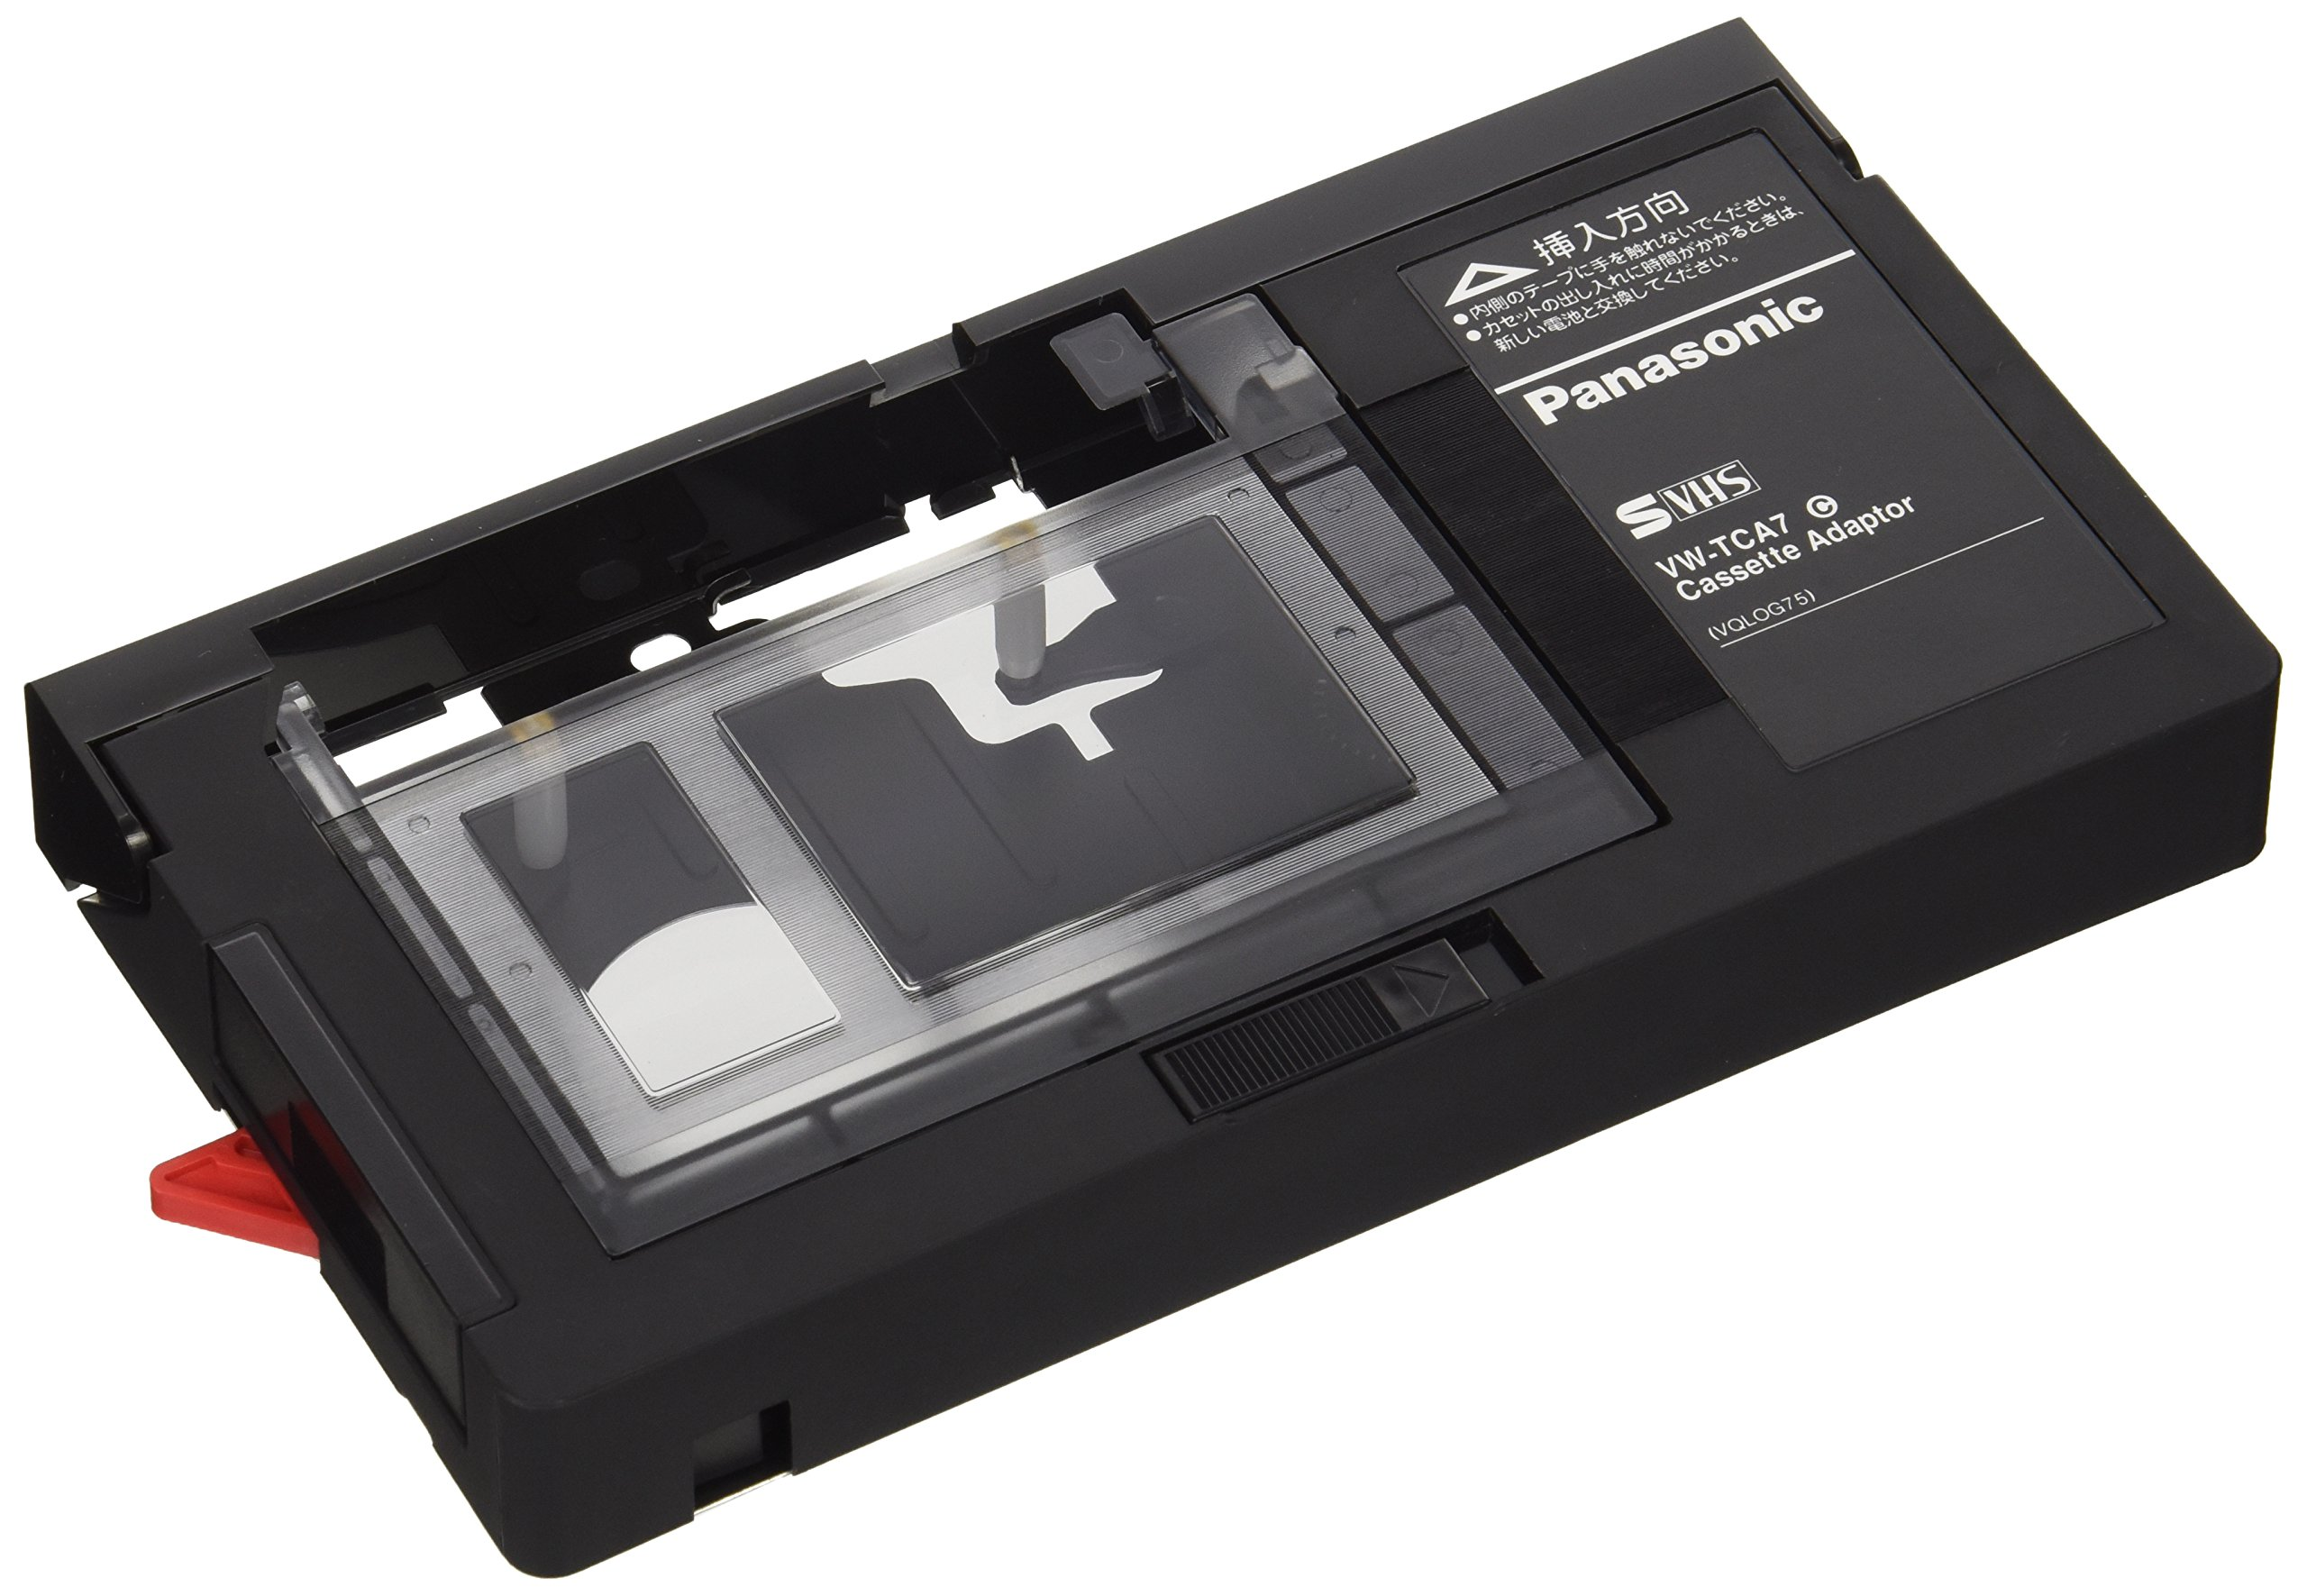 PANASONIC VHS Cassette Adapter VW-TCA7 from Japan - International Version (No Warranty) by Panasonic